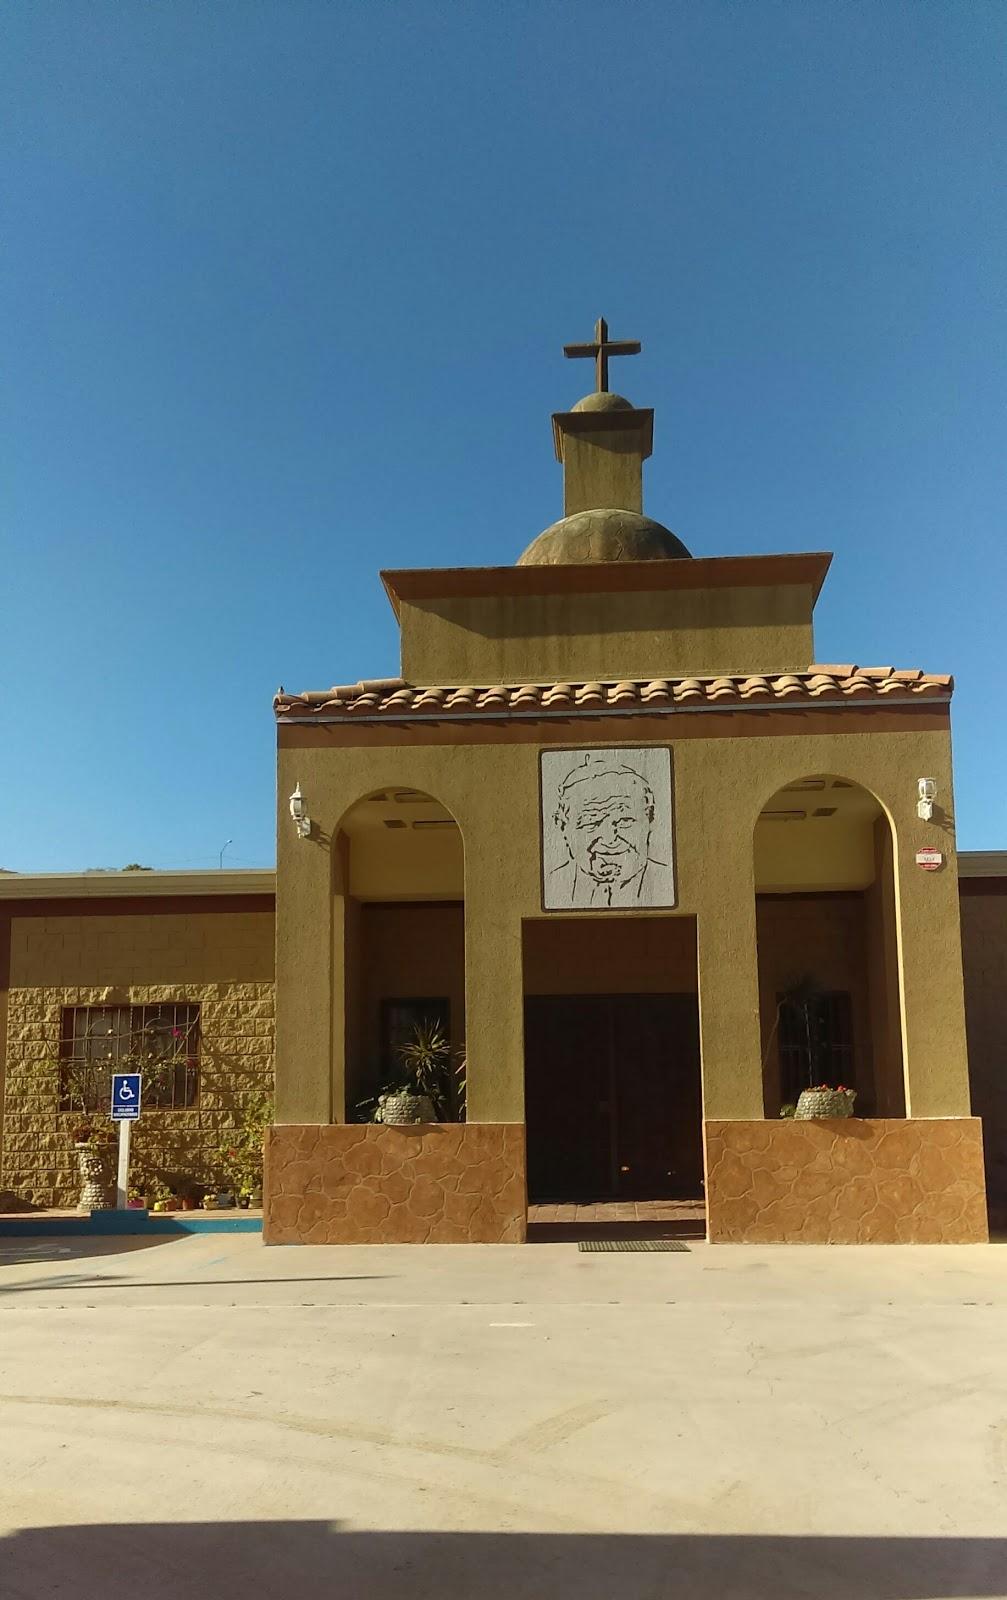 Asilo Beato Juan Pablo II - hospital  | Photo 1 of 1 | Address: vasco de Quiroga s/n., La Gloria, 22645 Tijuana, B.C., Mexico | Phone: 664 636 1609